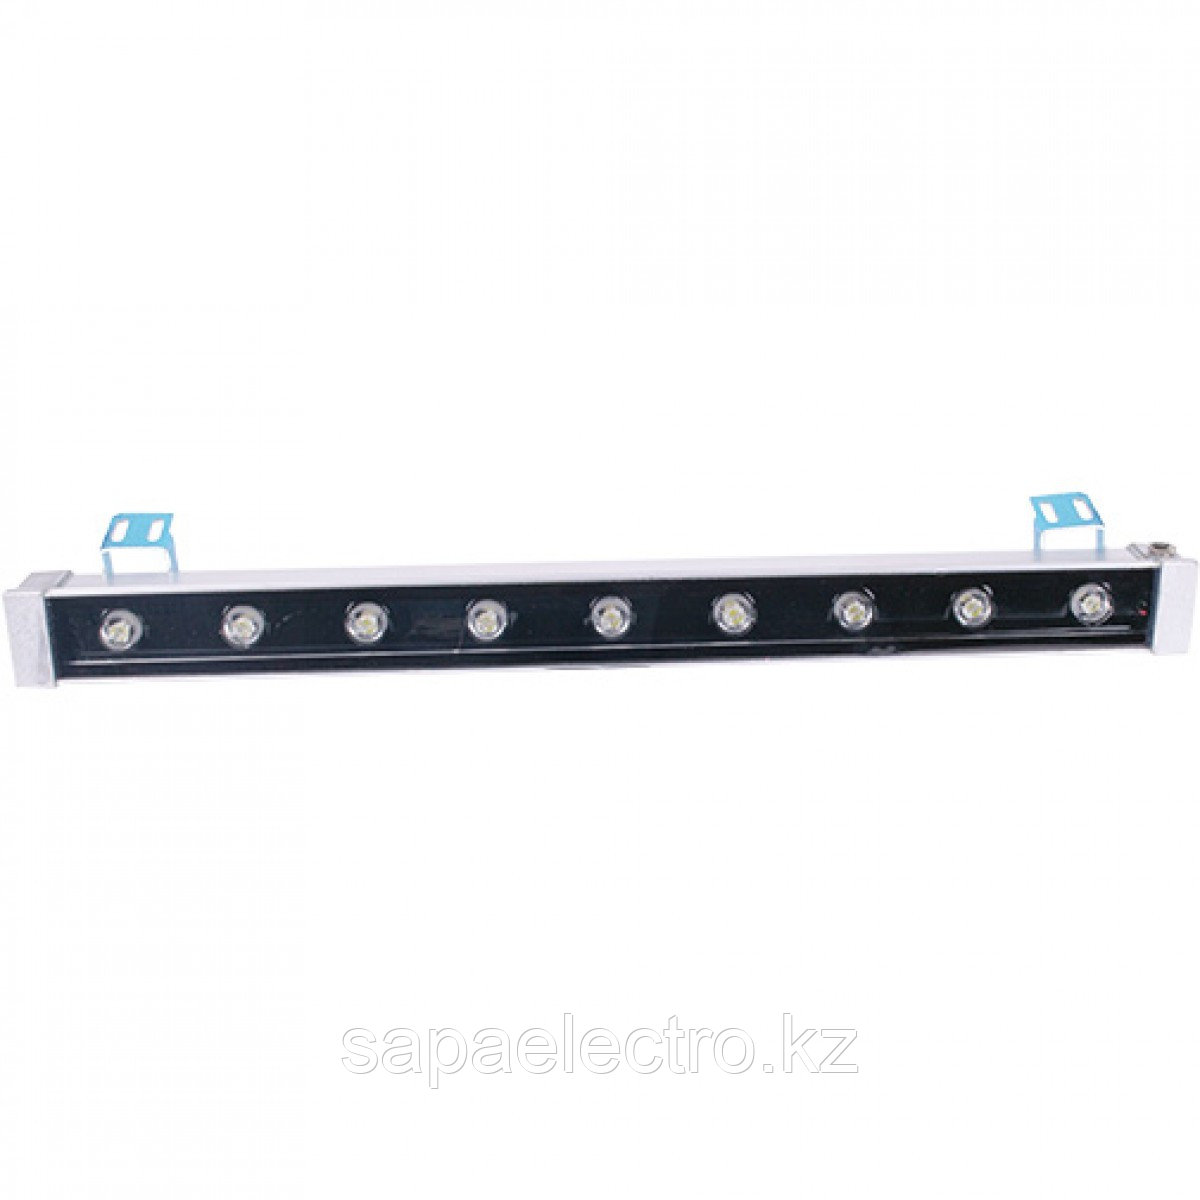 Прож-р LED WW01 9W 50см 6000K IP65 (TS) 20шт